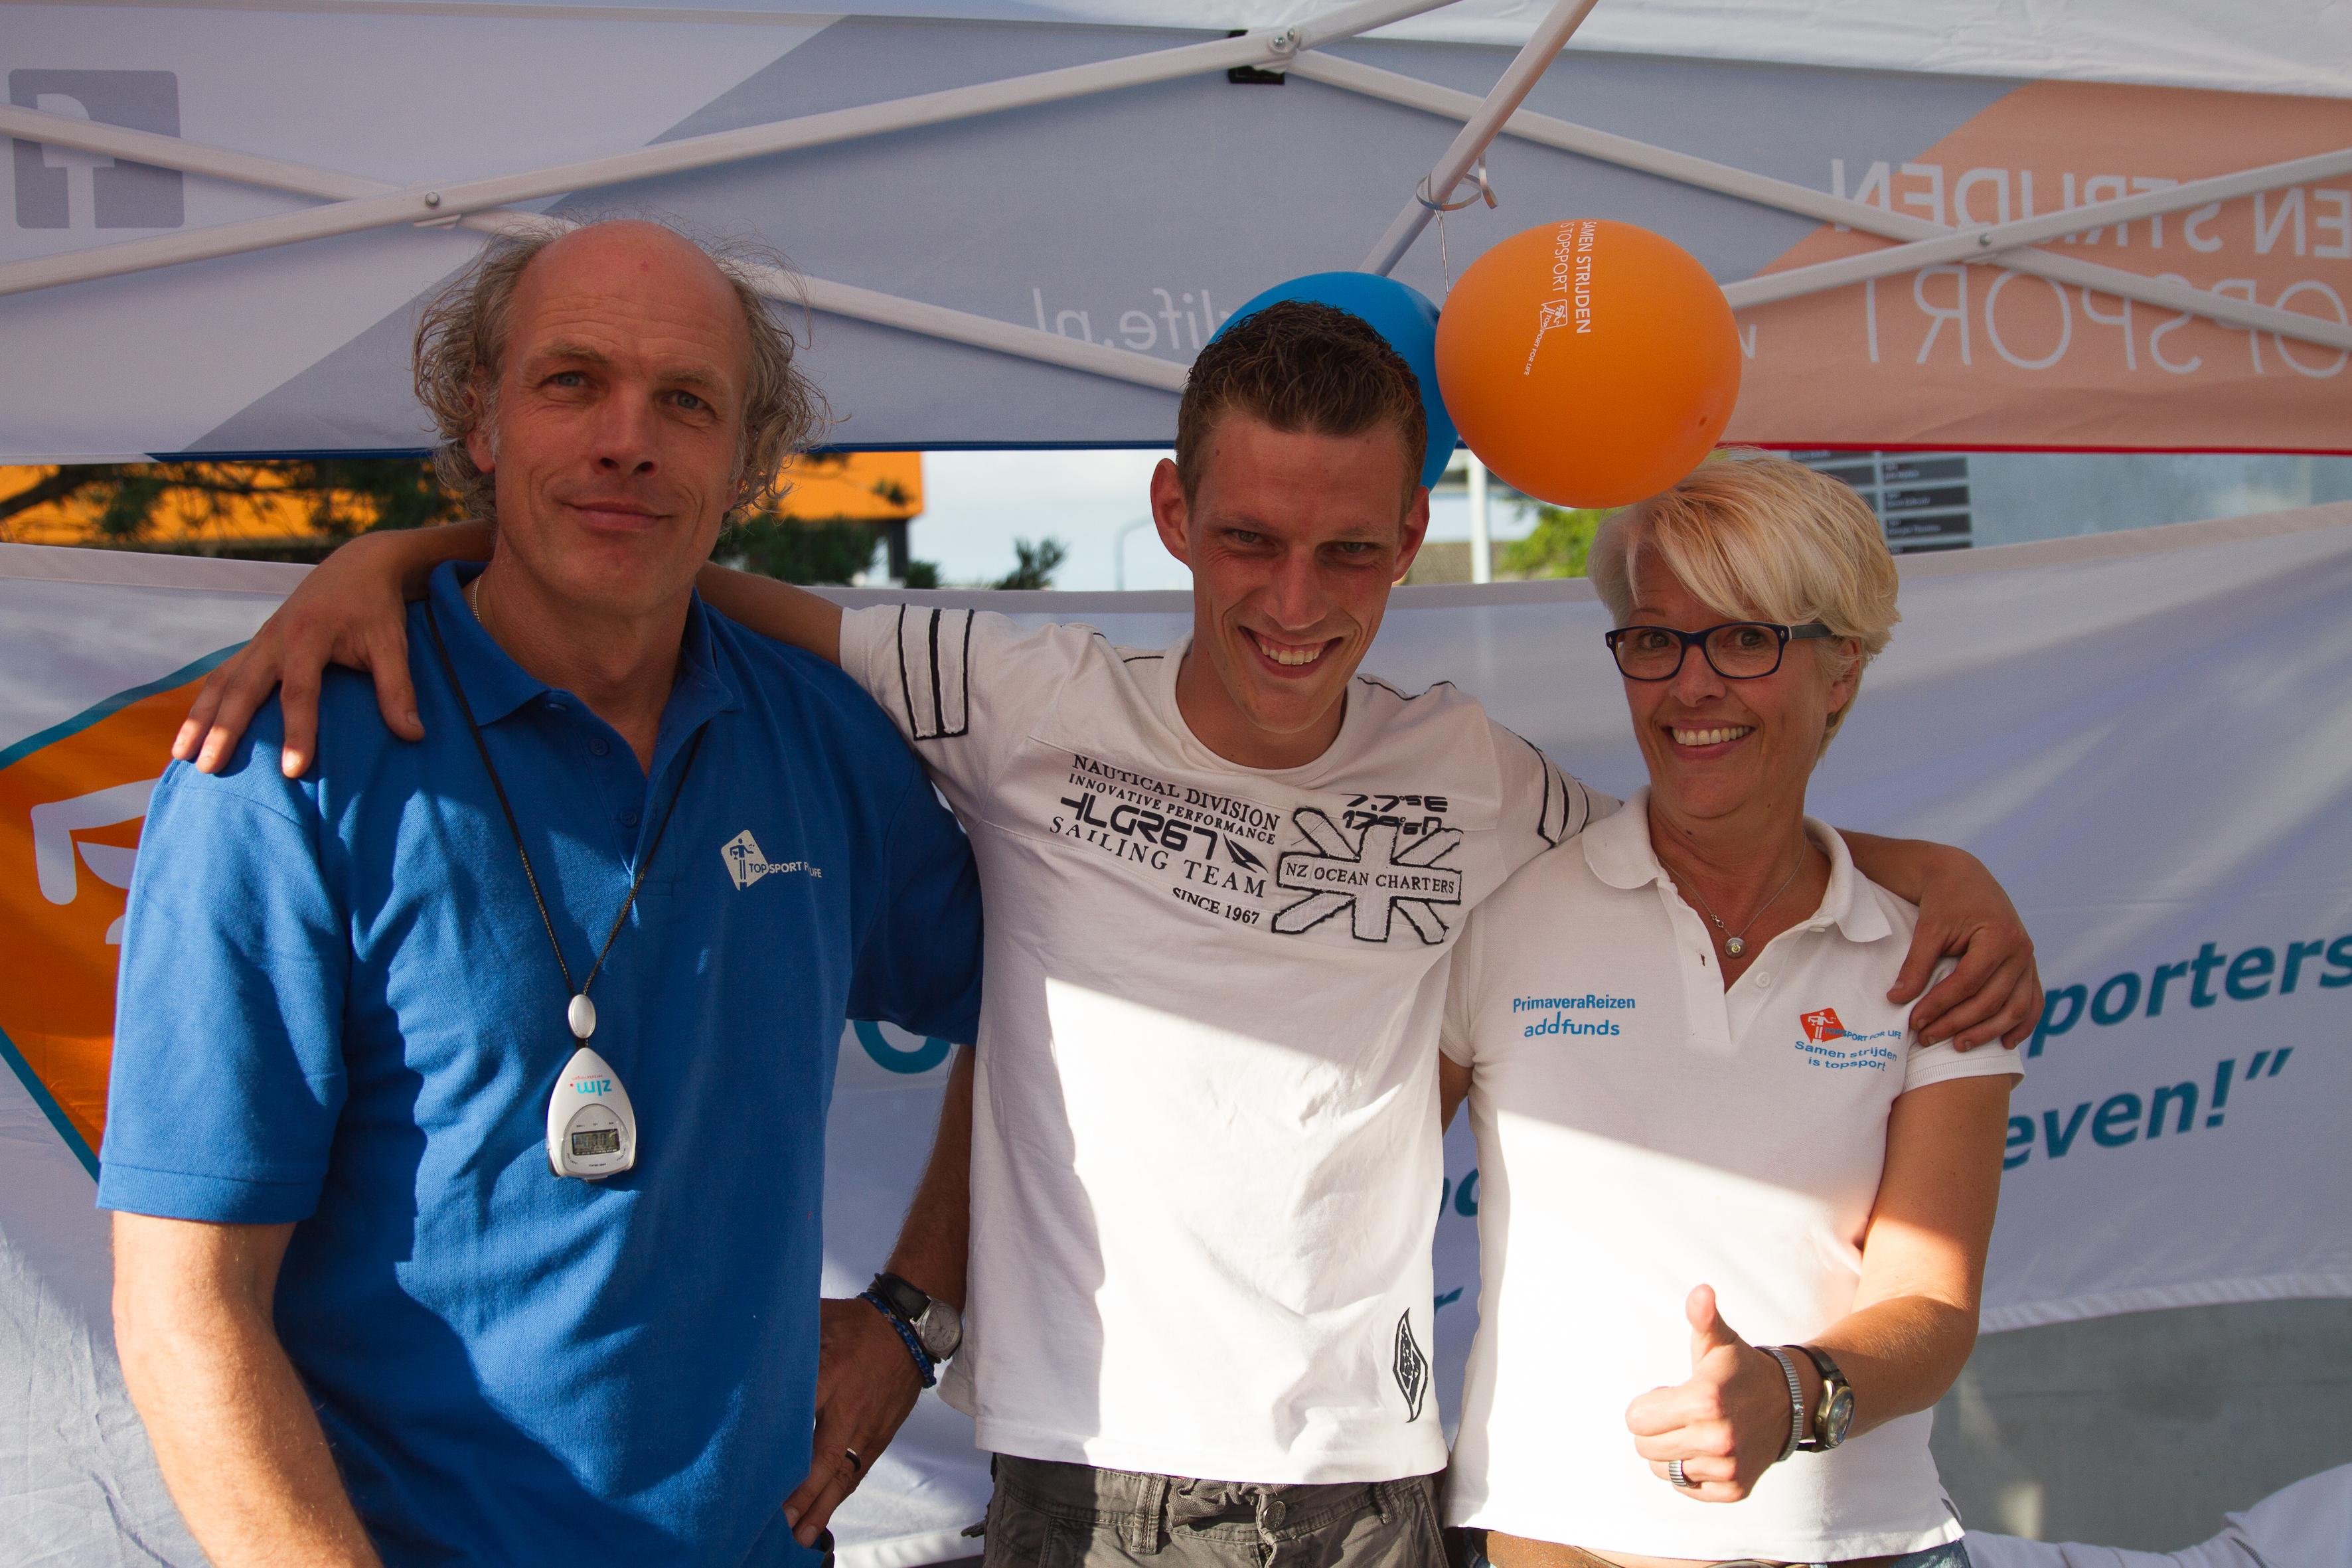 V.l.n.r. Bart van Gerwen, Joost van Riel en Nita van Vliet